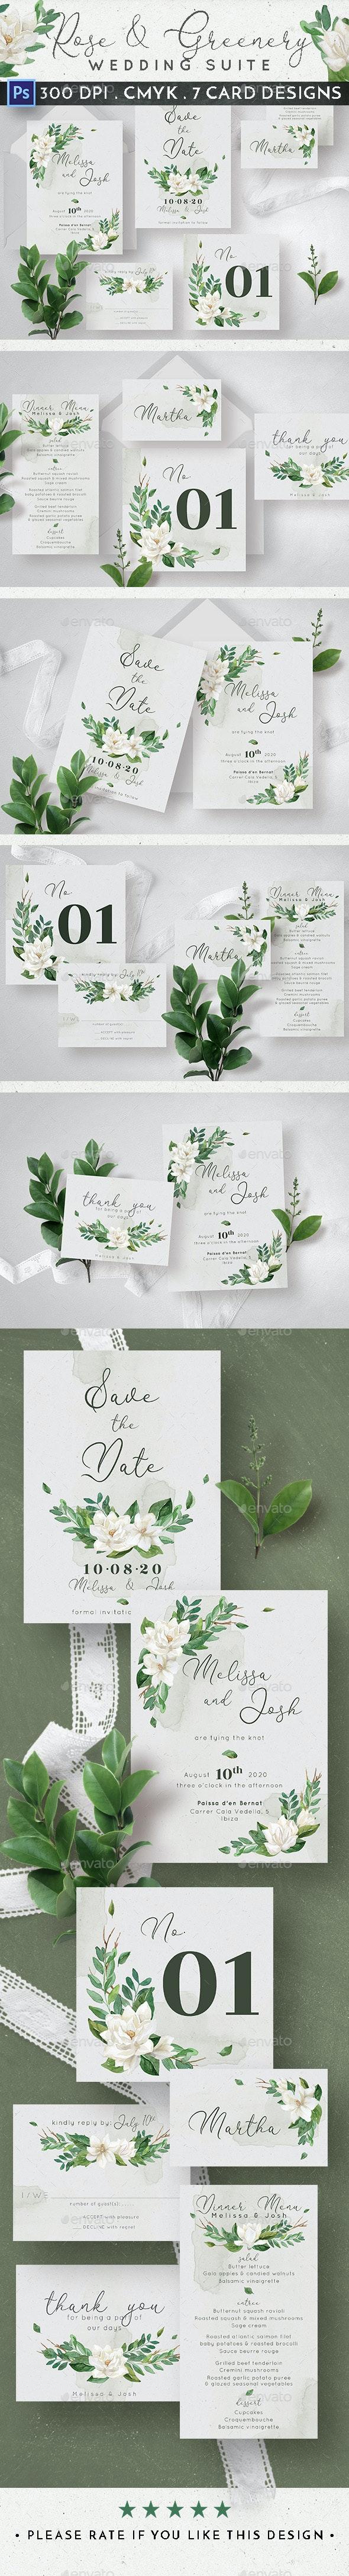 Rose & Greenery Wedding Suite - Weddings Cards & Invites